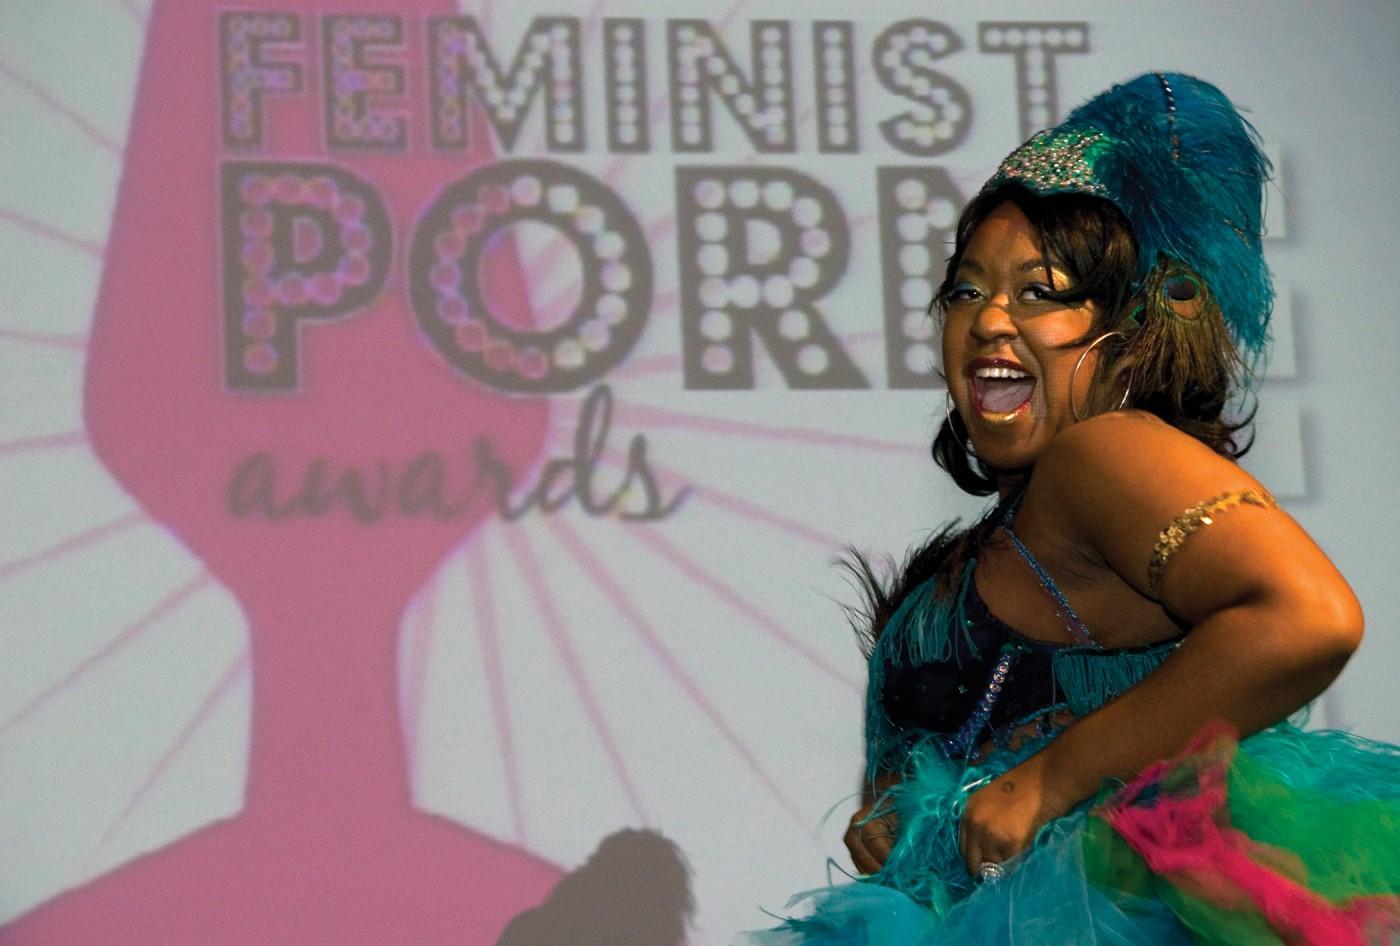 <em>CoCo LaCreme Feminist Porn Awards Performance, 2009</em>, </span><span> Marc S. Bonham Centre for Sexual Diversity Studies Sexual Representation Collection